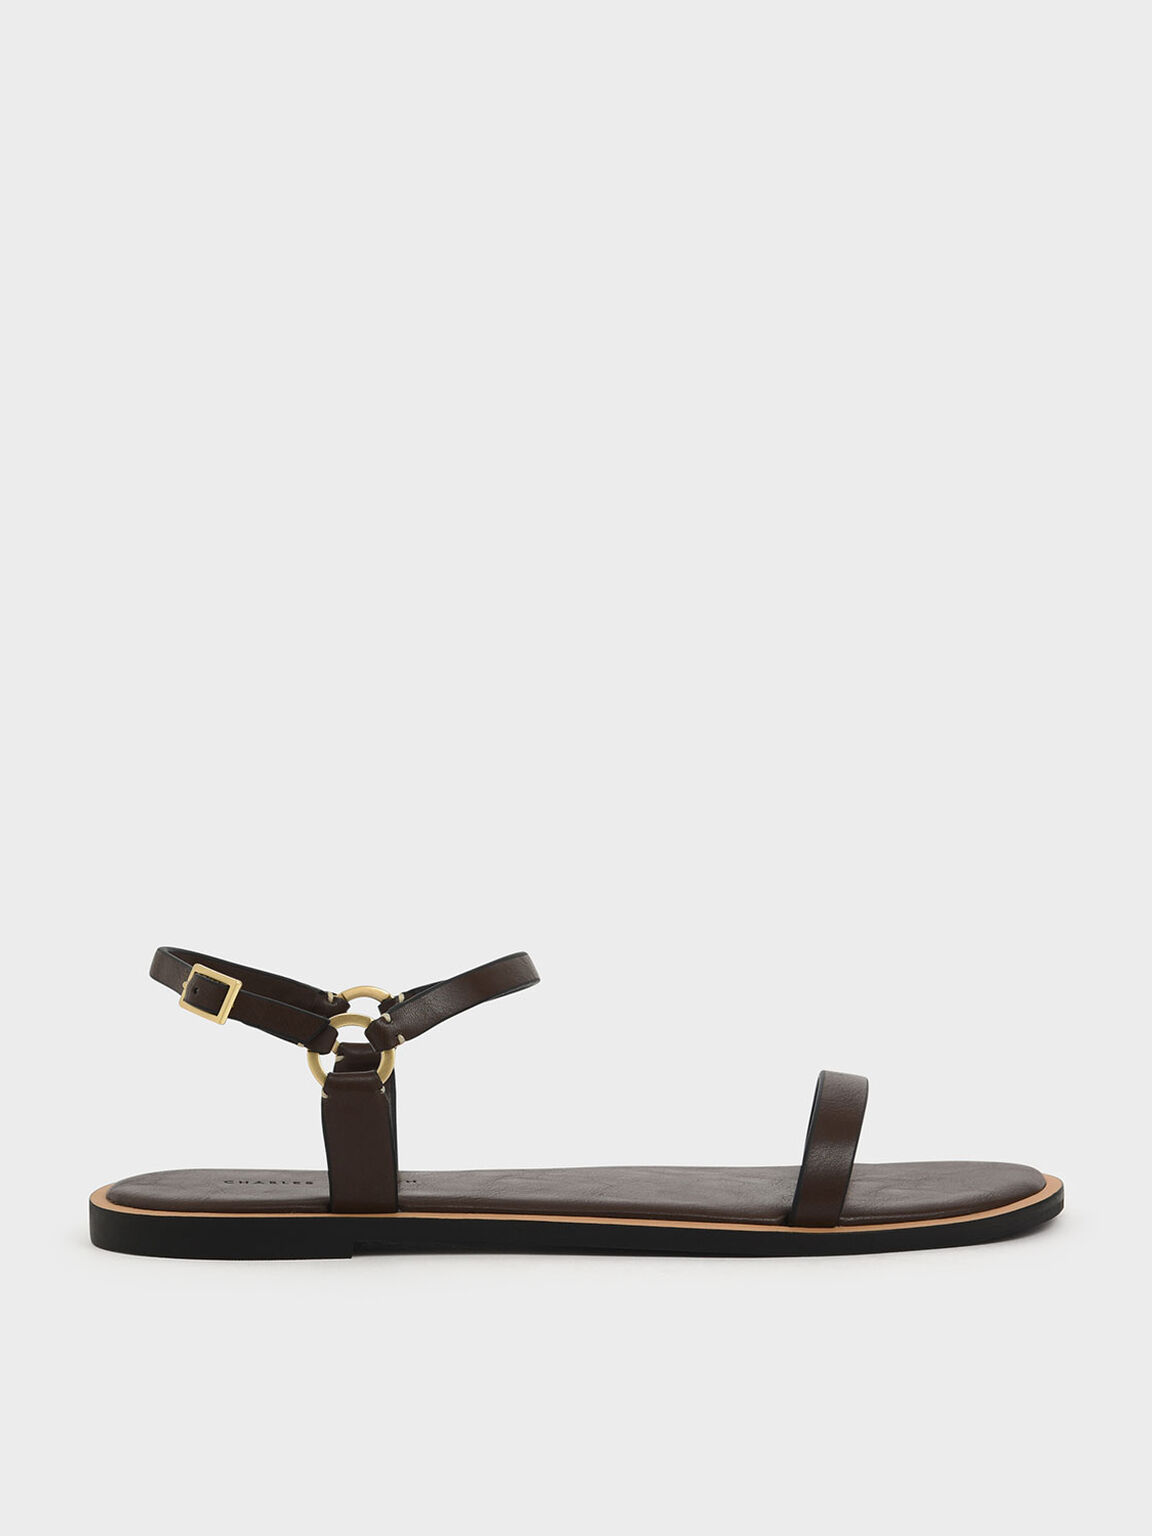 Ankle Strap Flat Sandals, Brown, hi-res